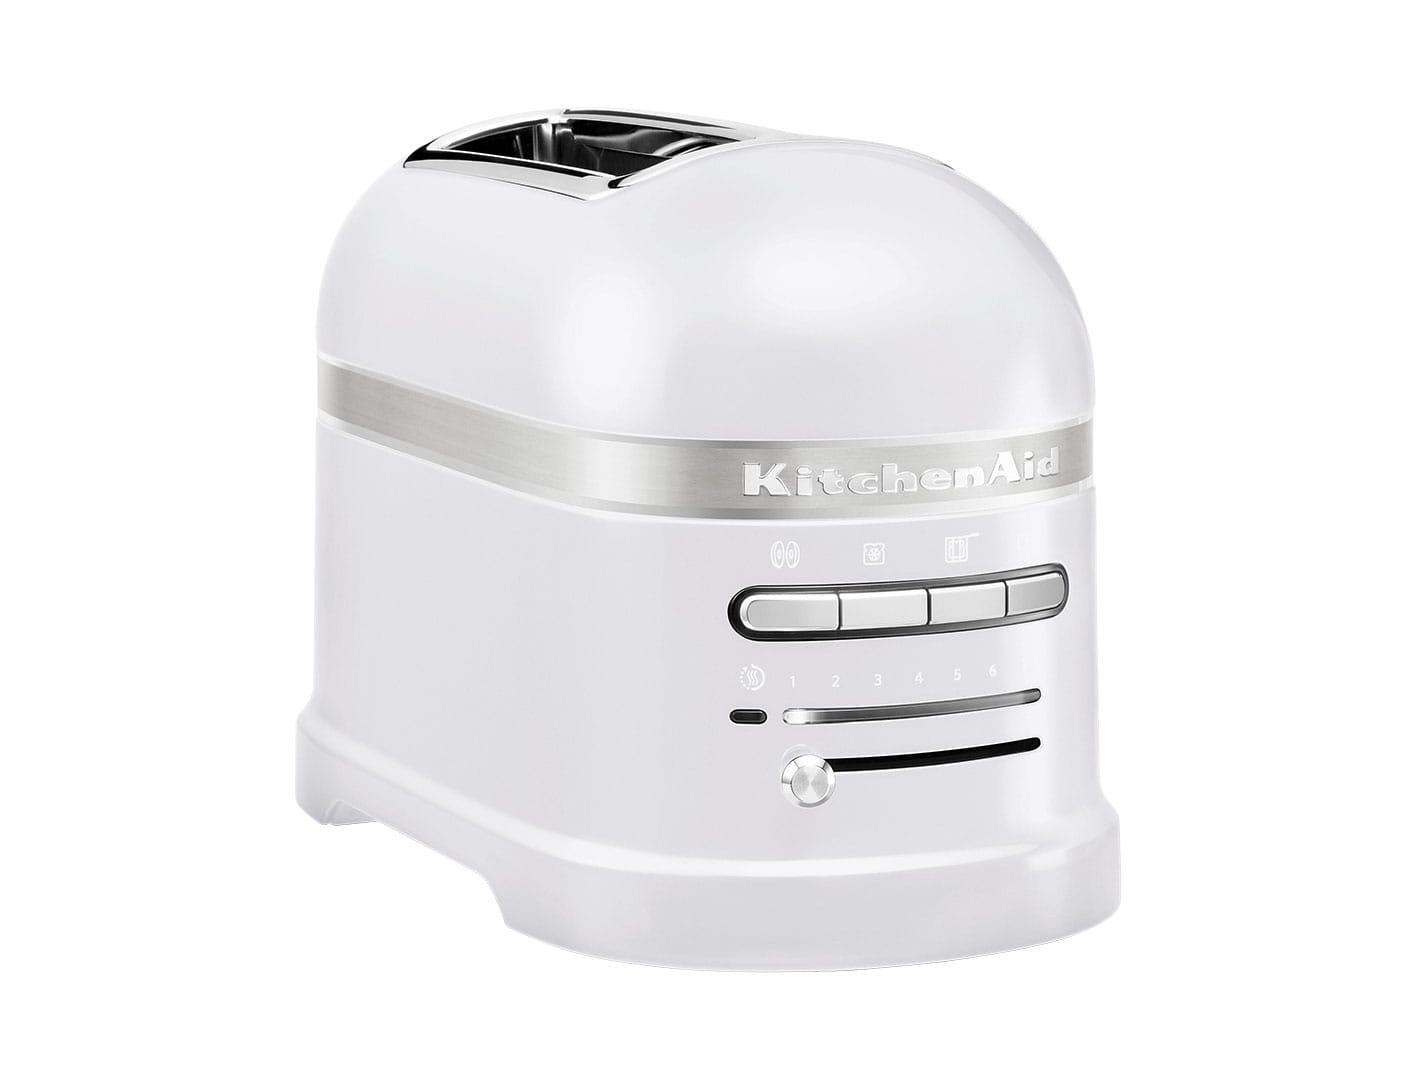 KitchenAid ARTISAN 2 slot Toaster 5KMT2204